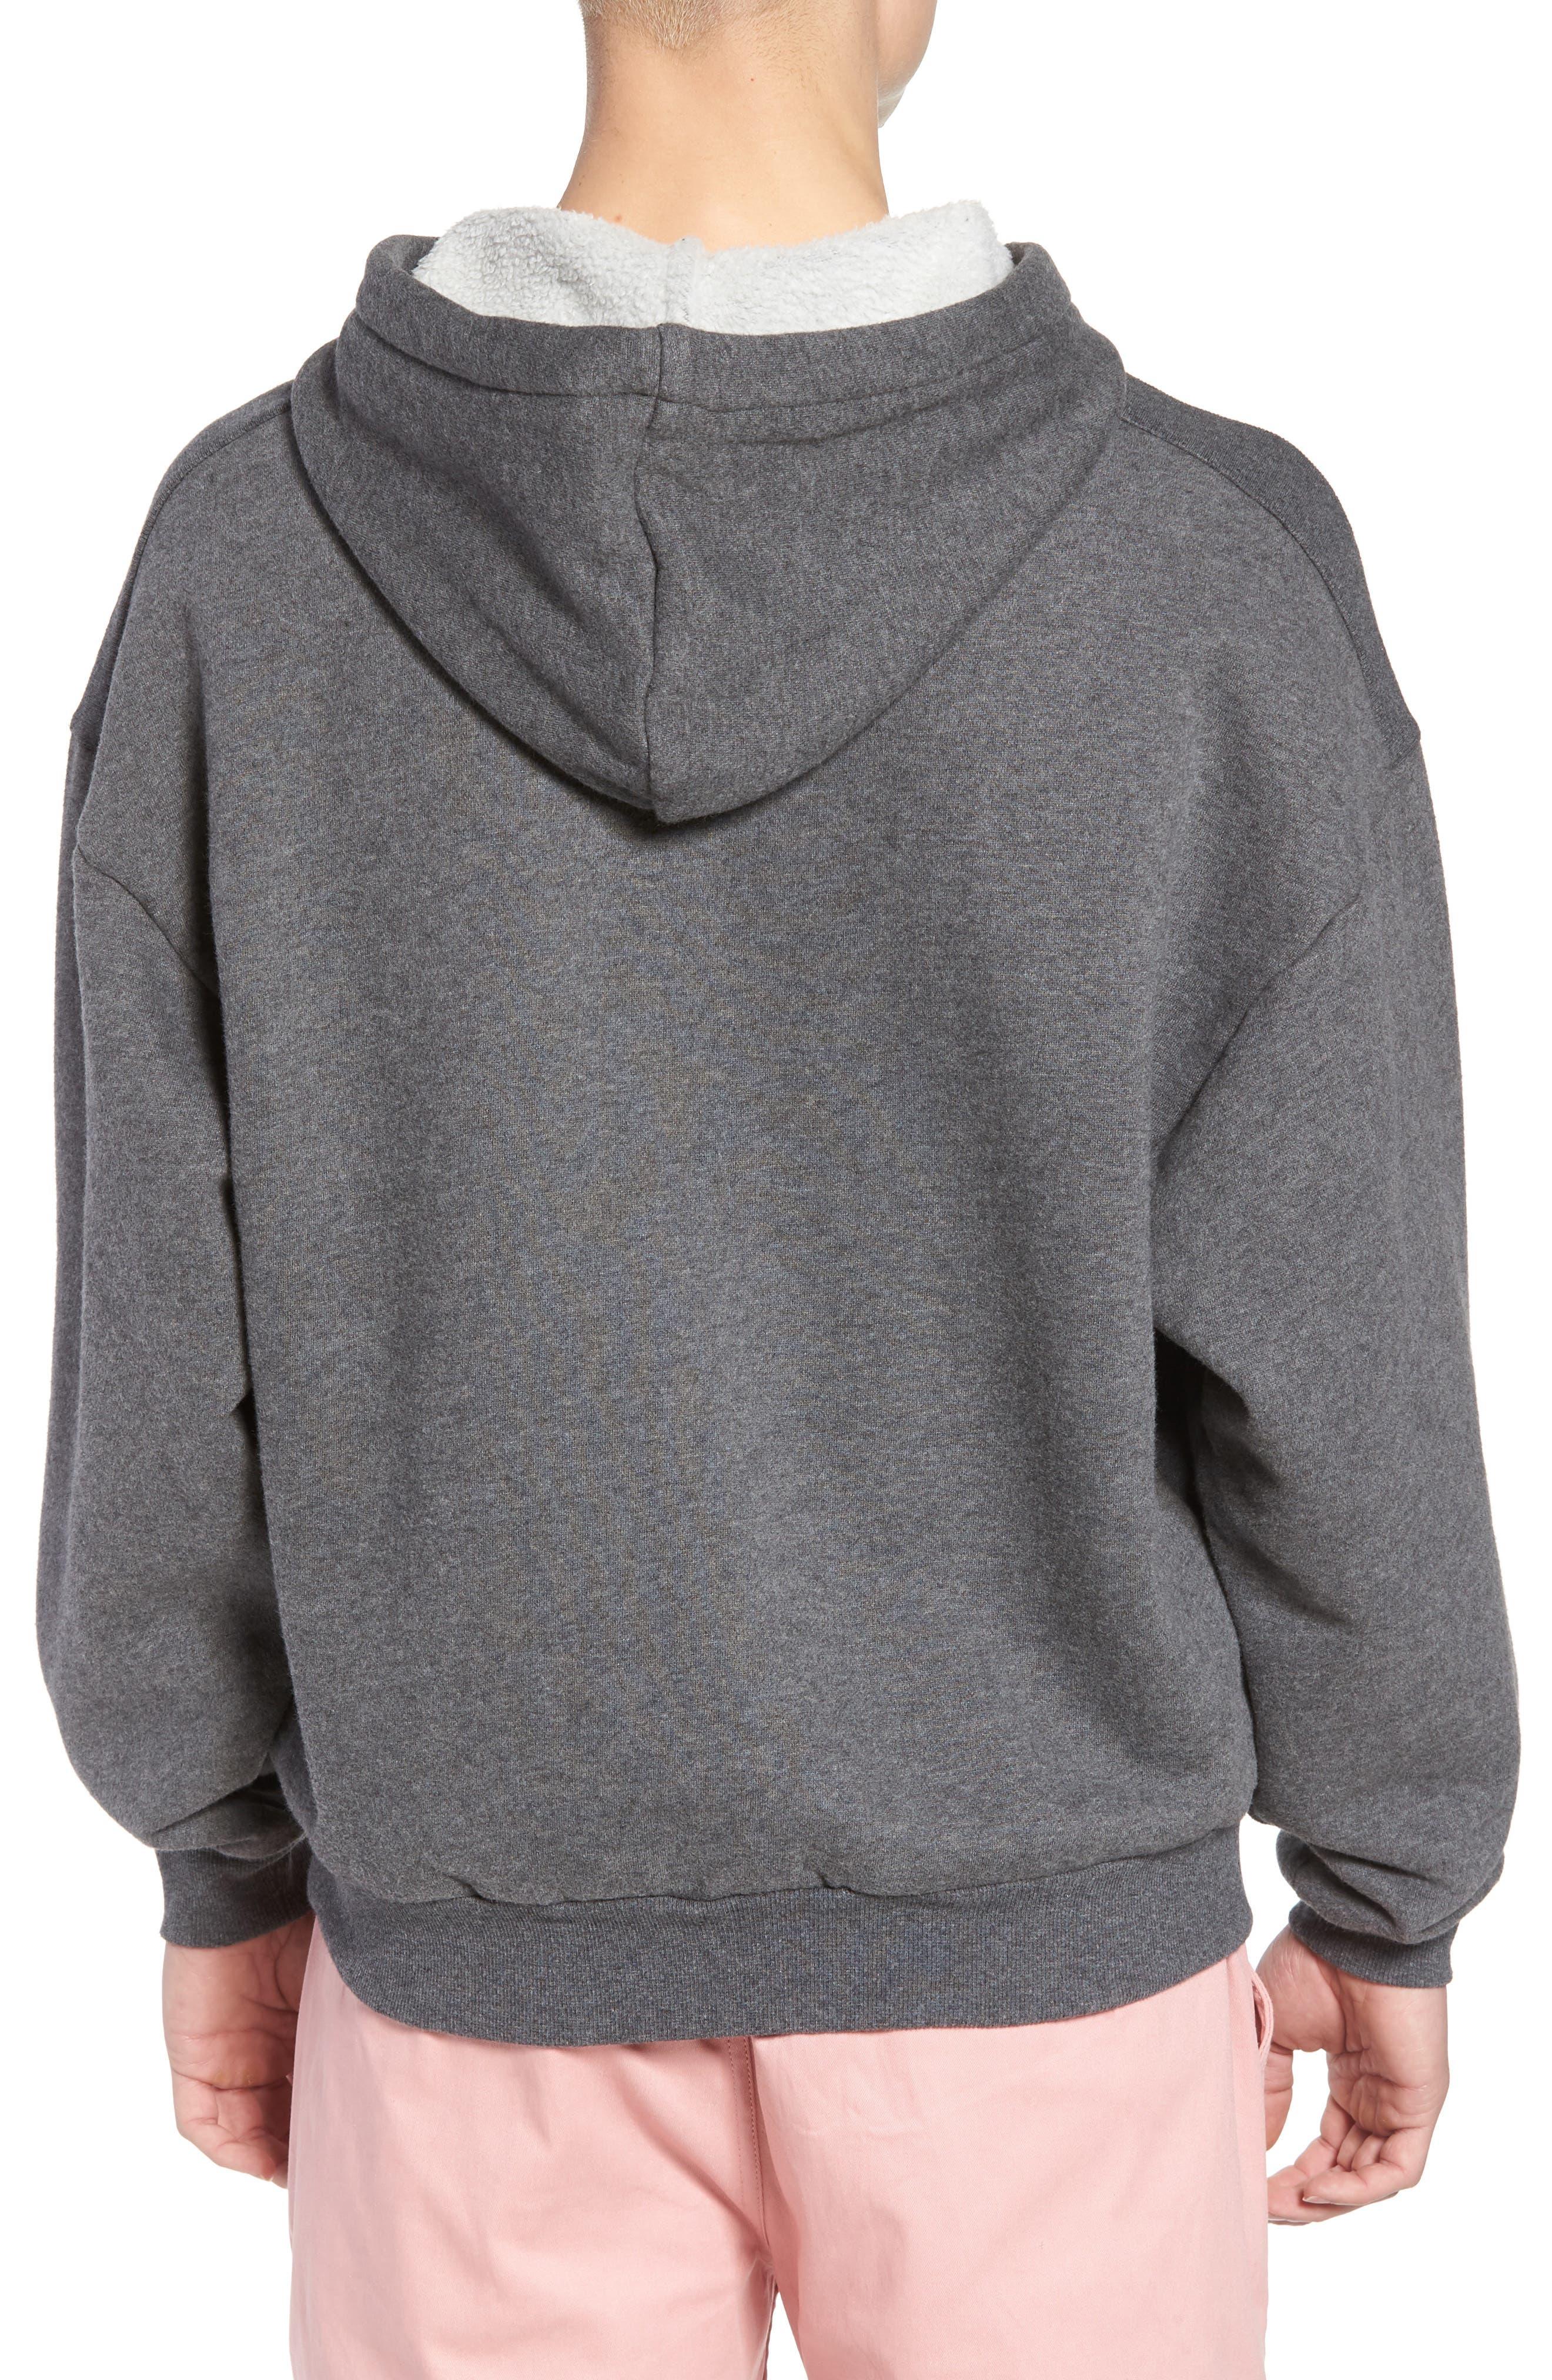 Milton Hoodie Sweatshirt,                             Alternate thumbnail 2, color,                             020